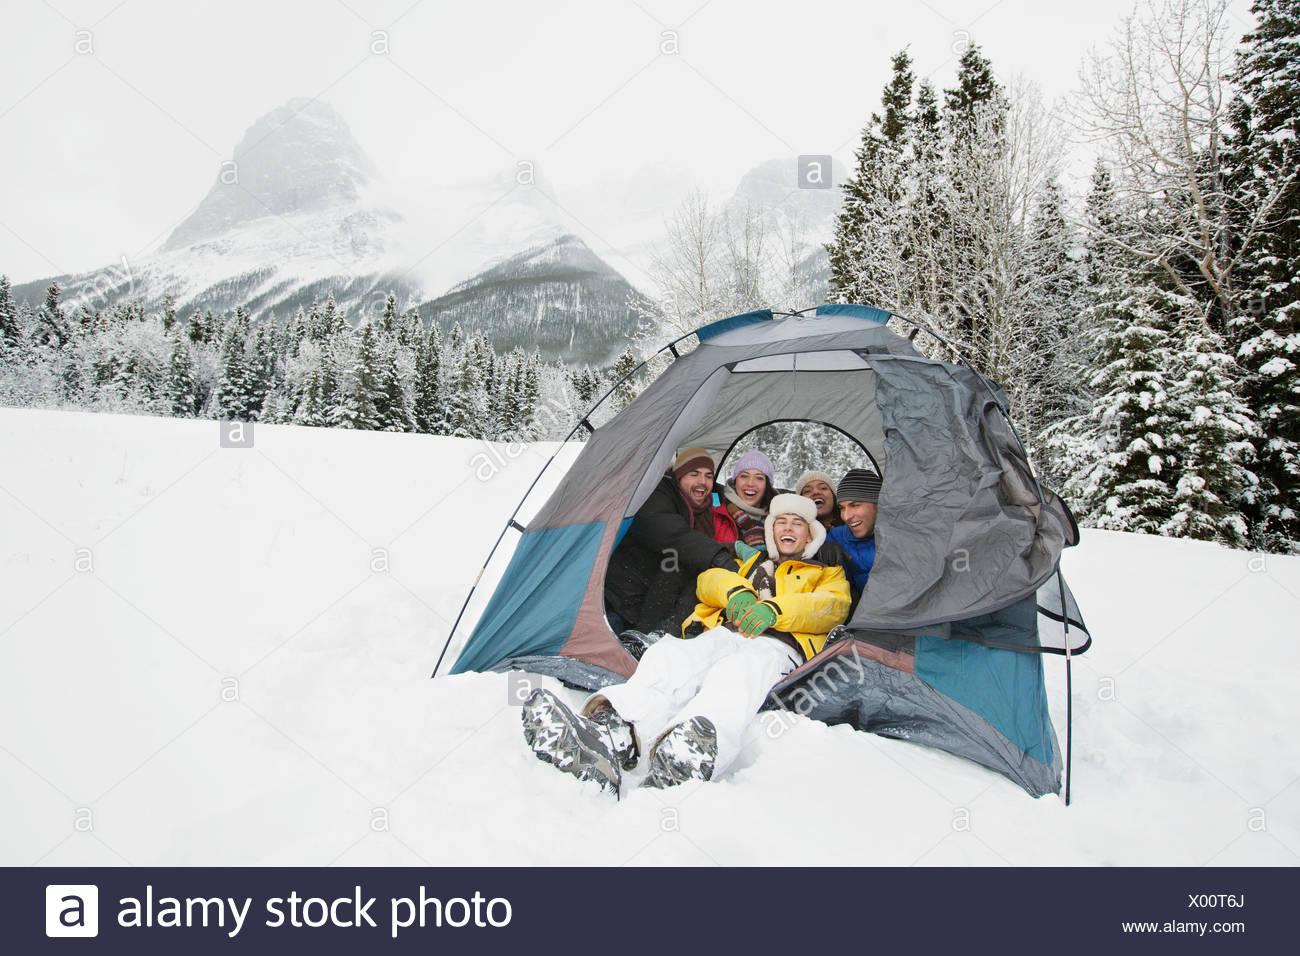 young adults enjoying winter camping - Stock Image